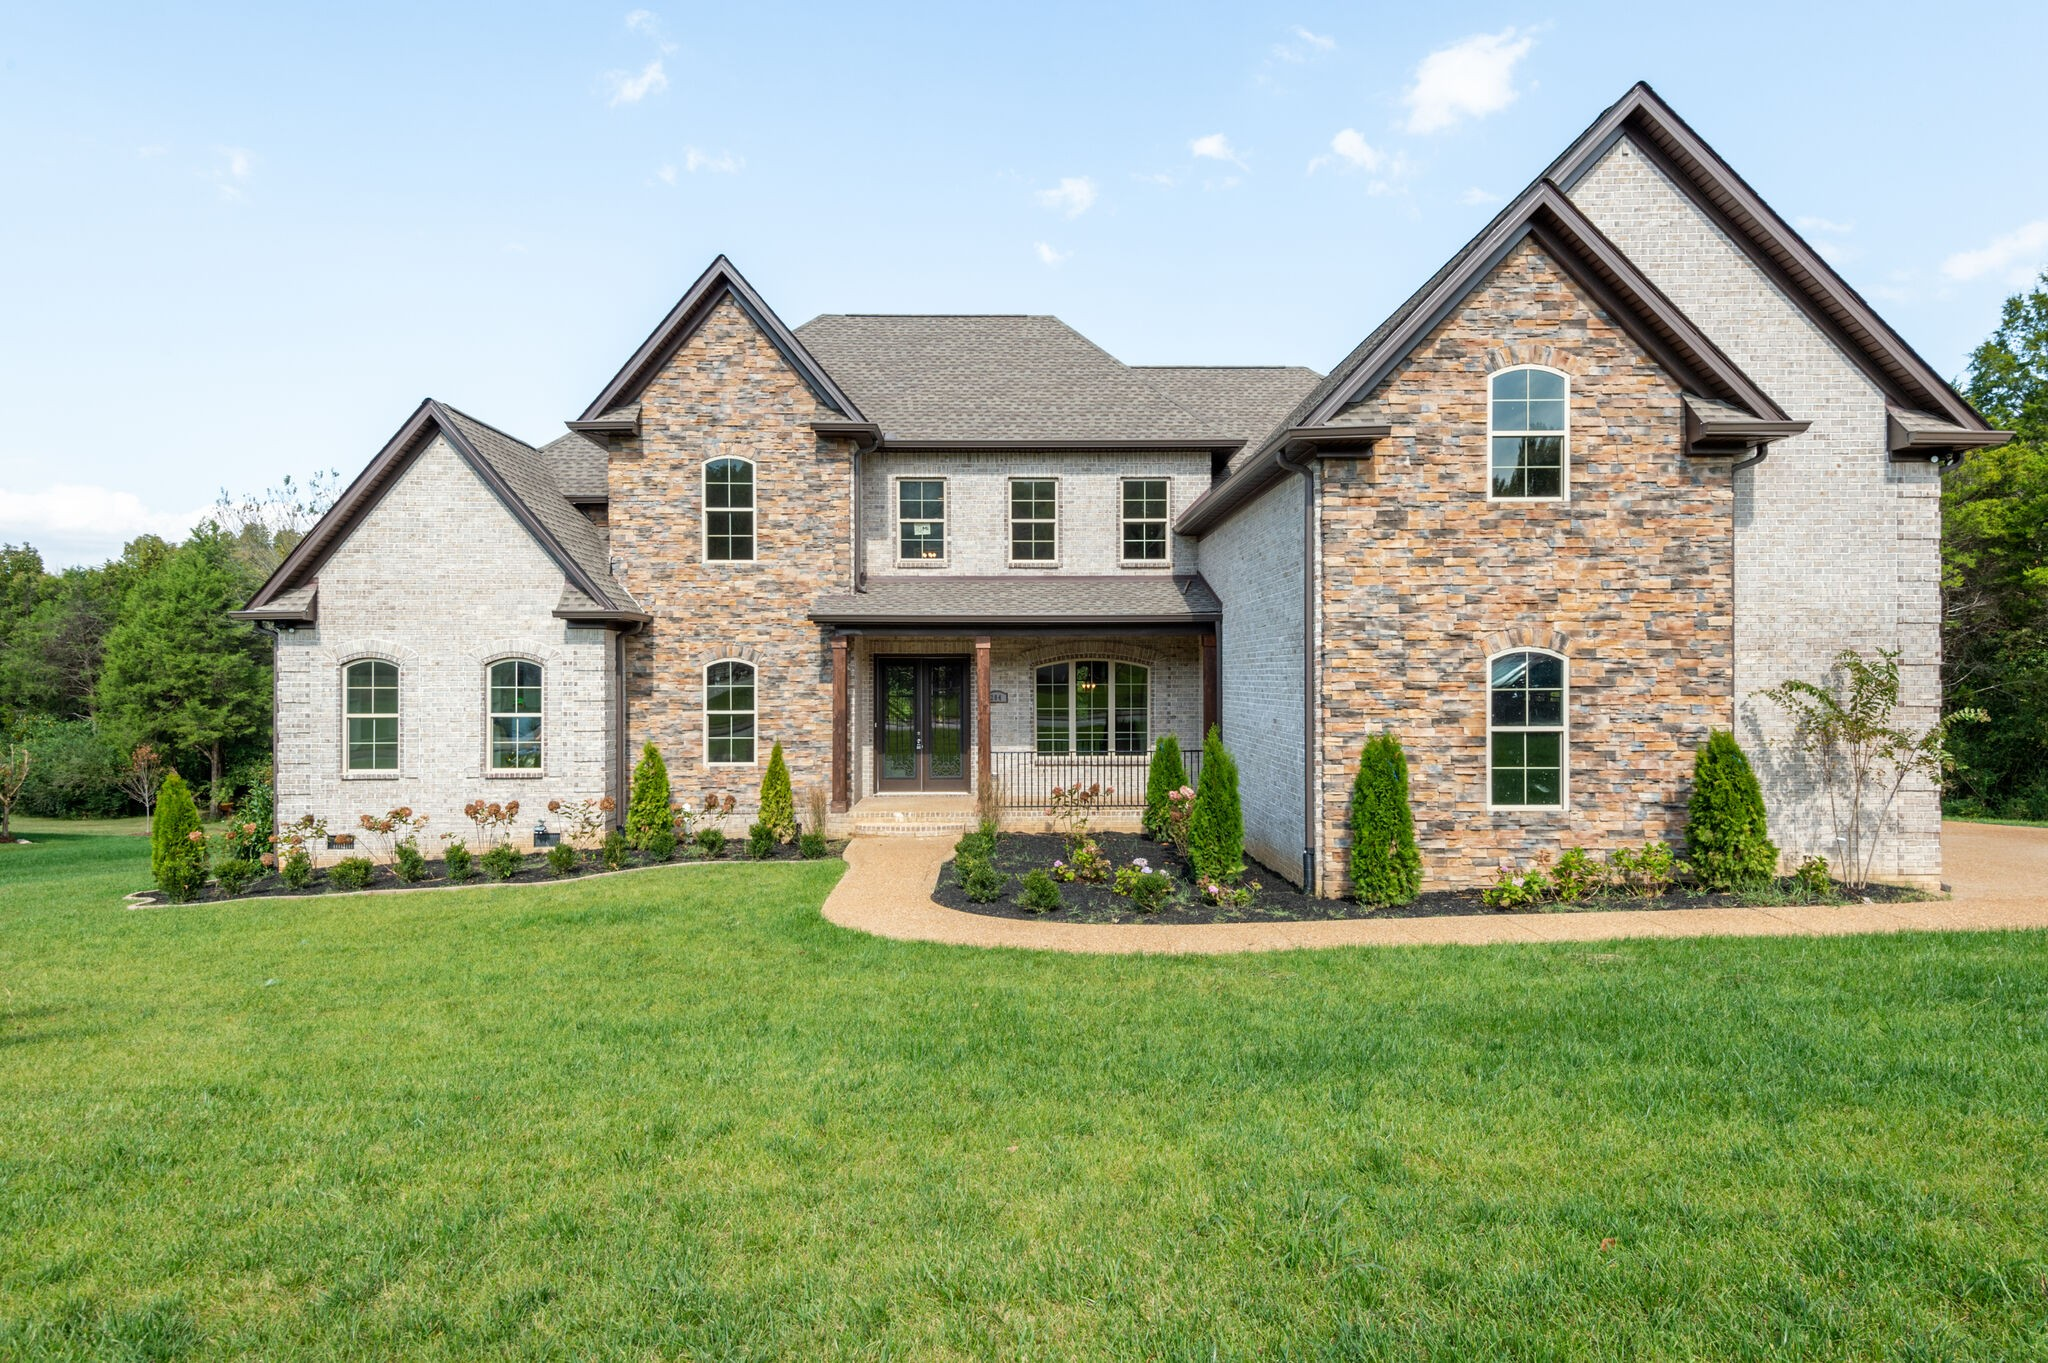 204 W Chandler Ct Property Photo